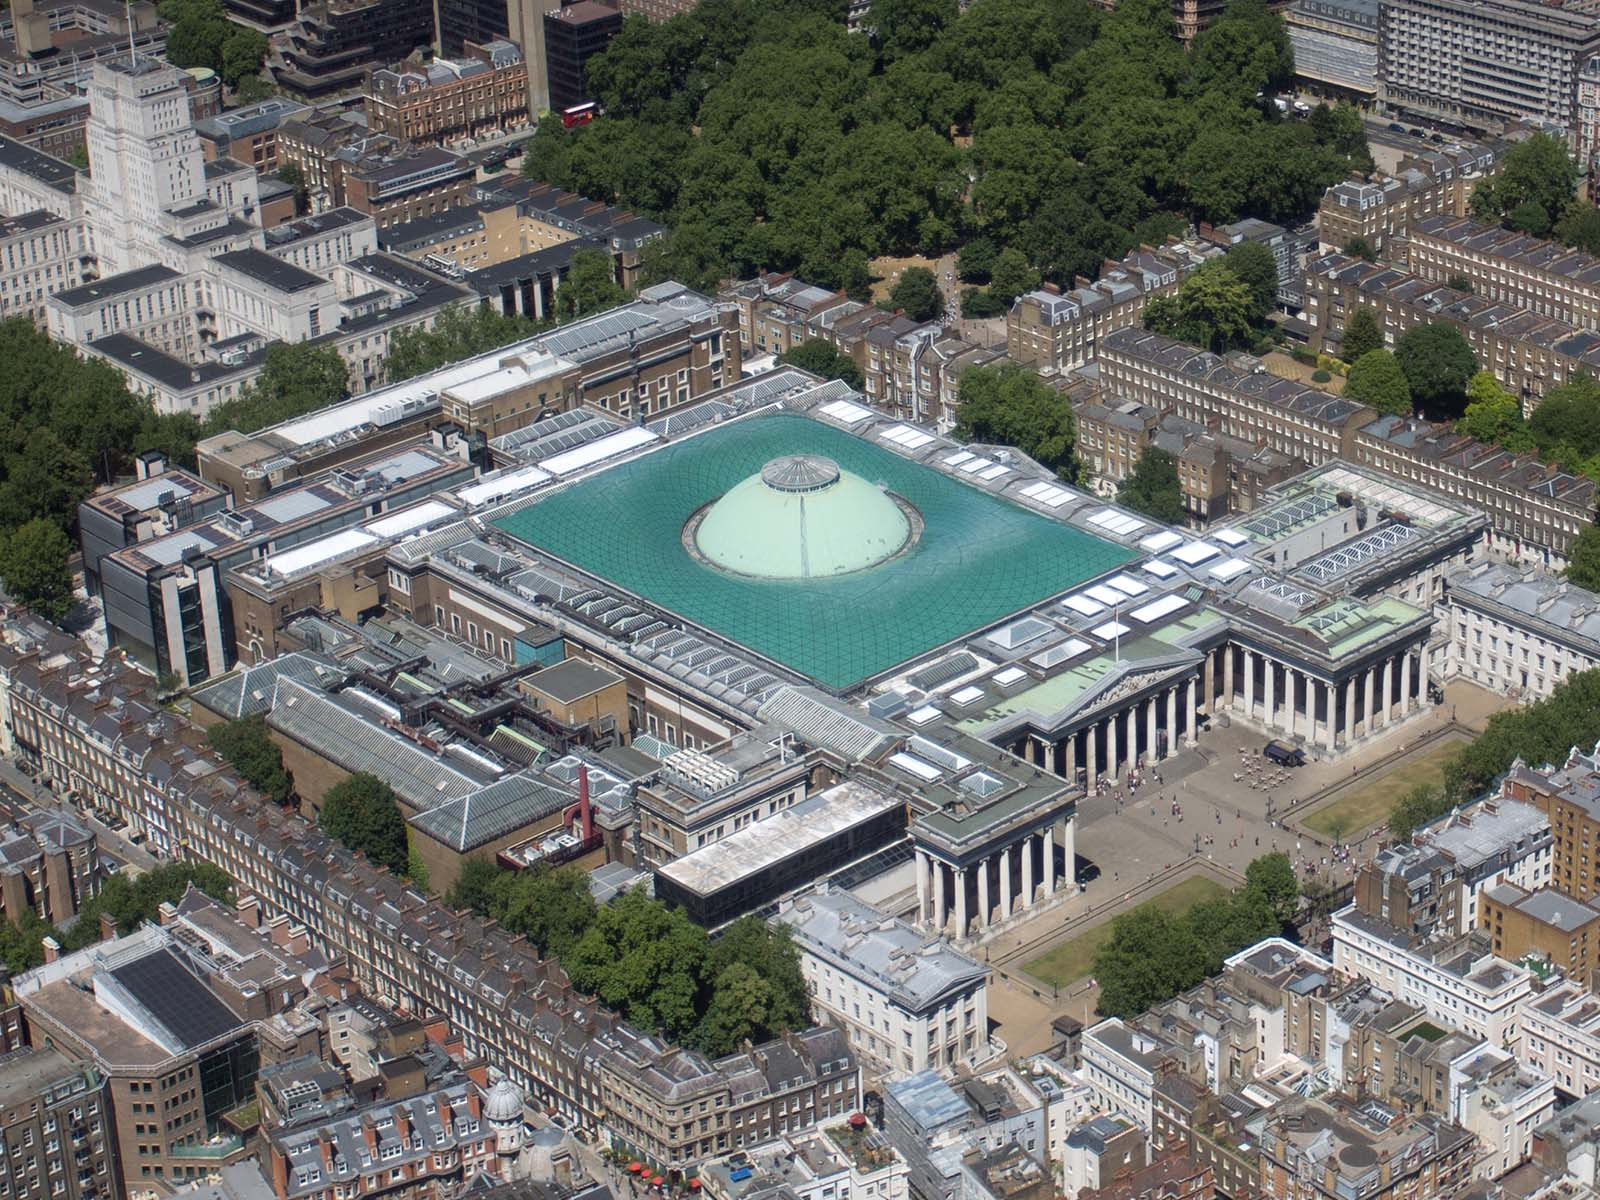 Aerial shot of the British Museum, London. © Luke Massey / CC-BY-SA-2.0